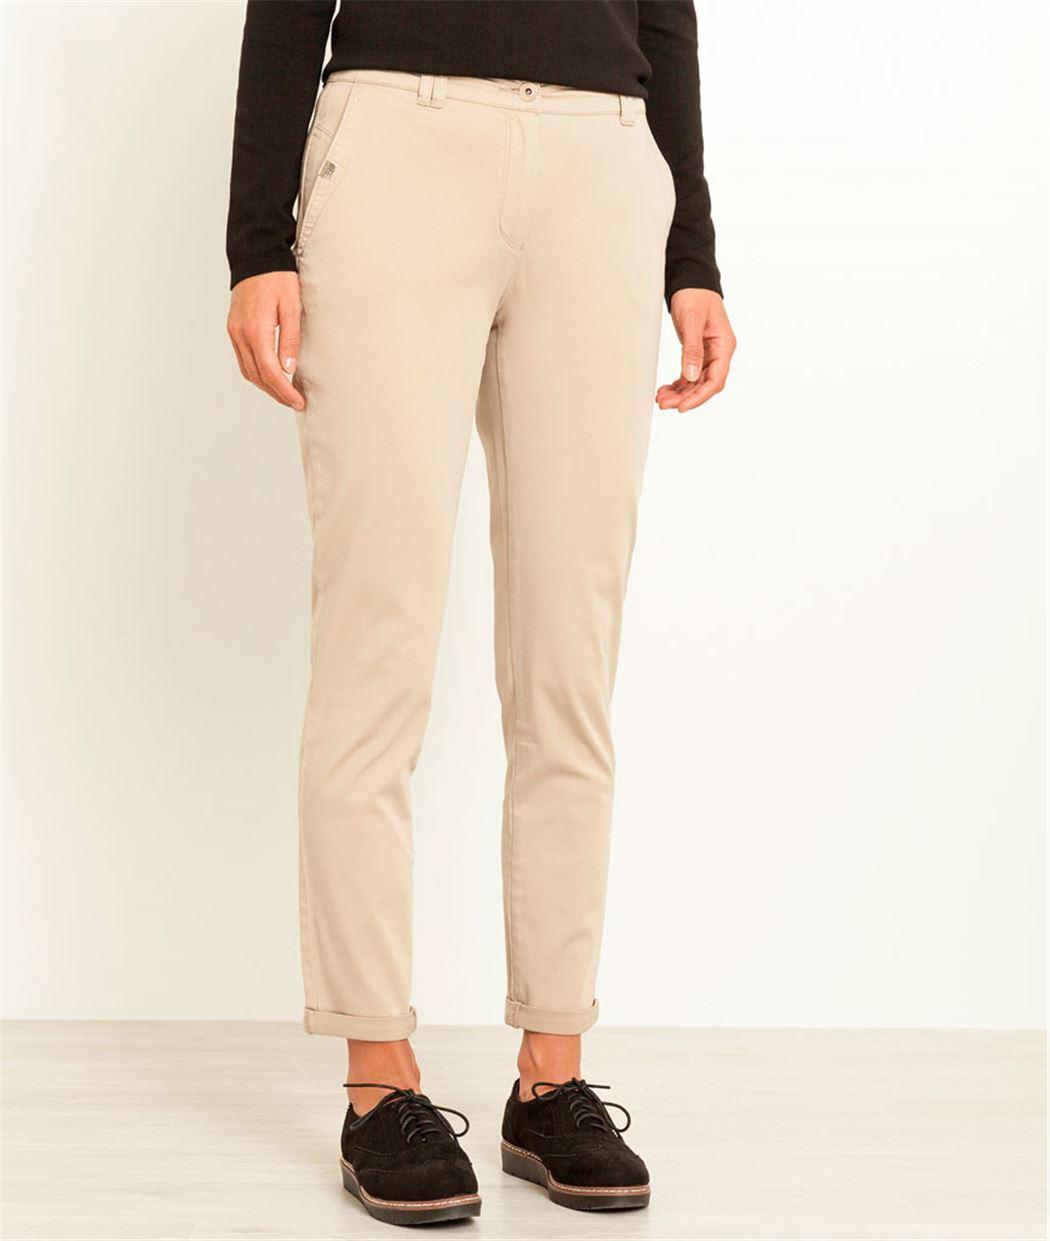 Pantalon femme chino MASTIC